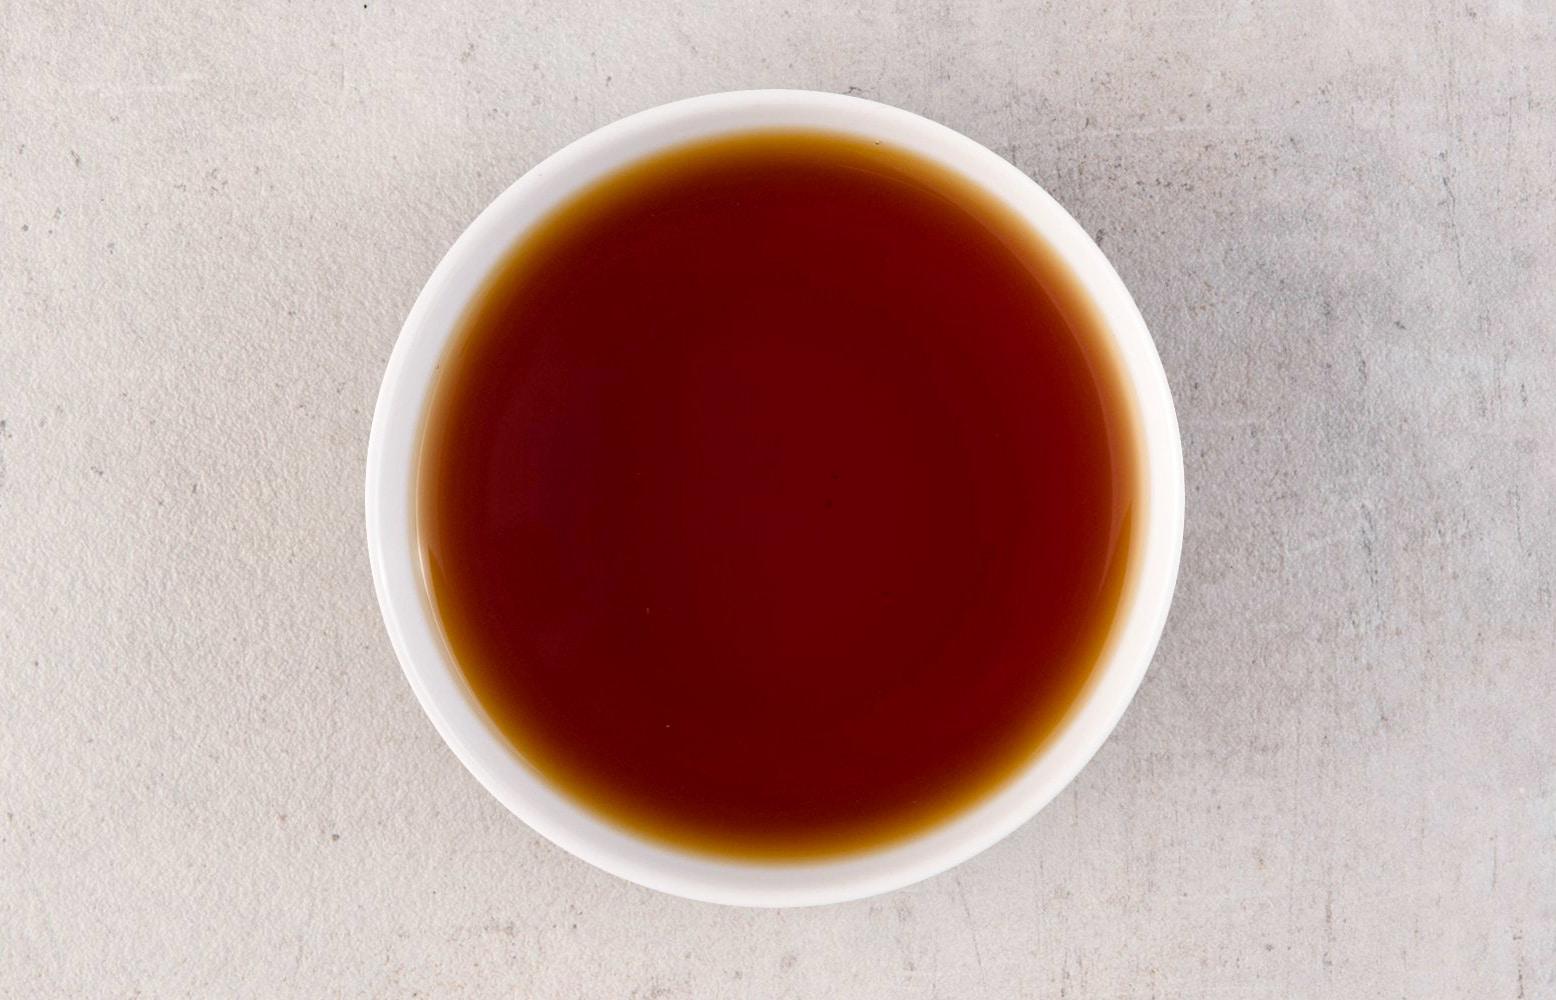 A cup of english breakfast black tea